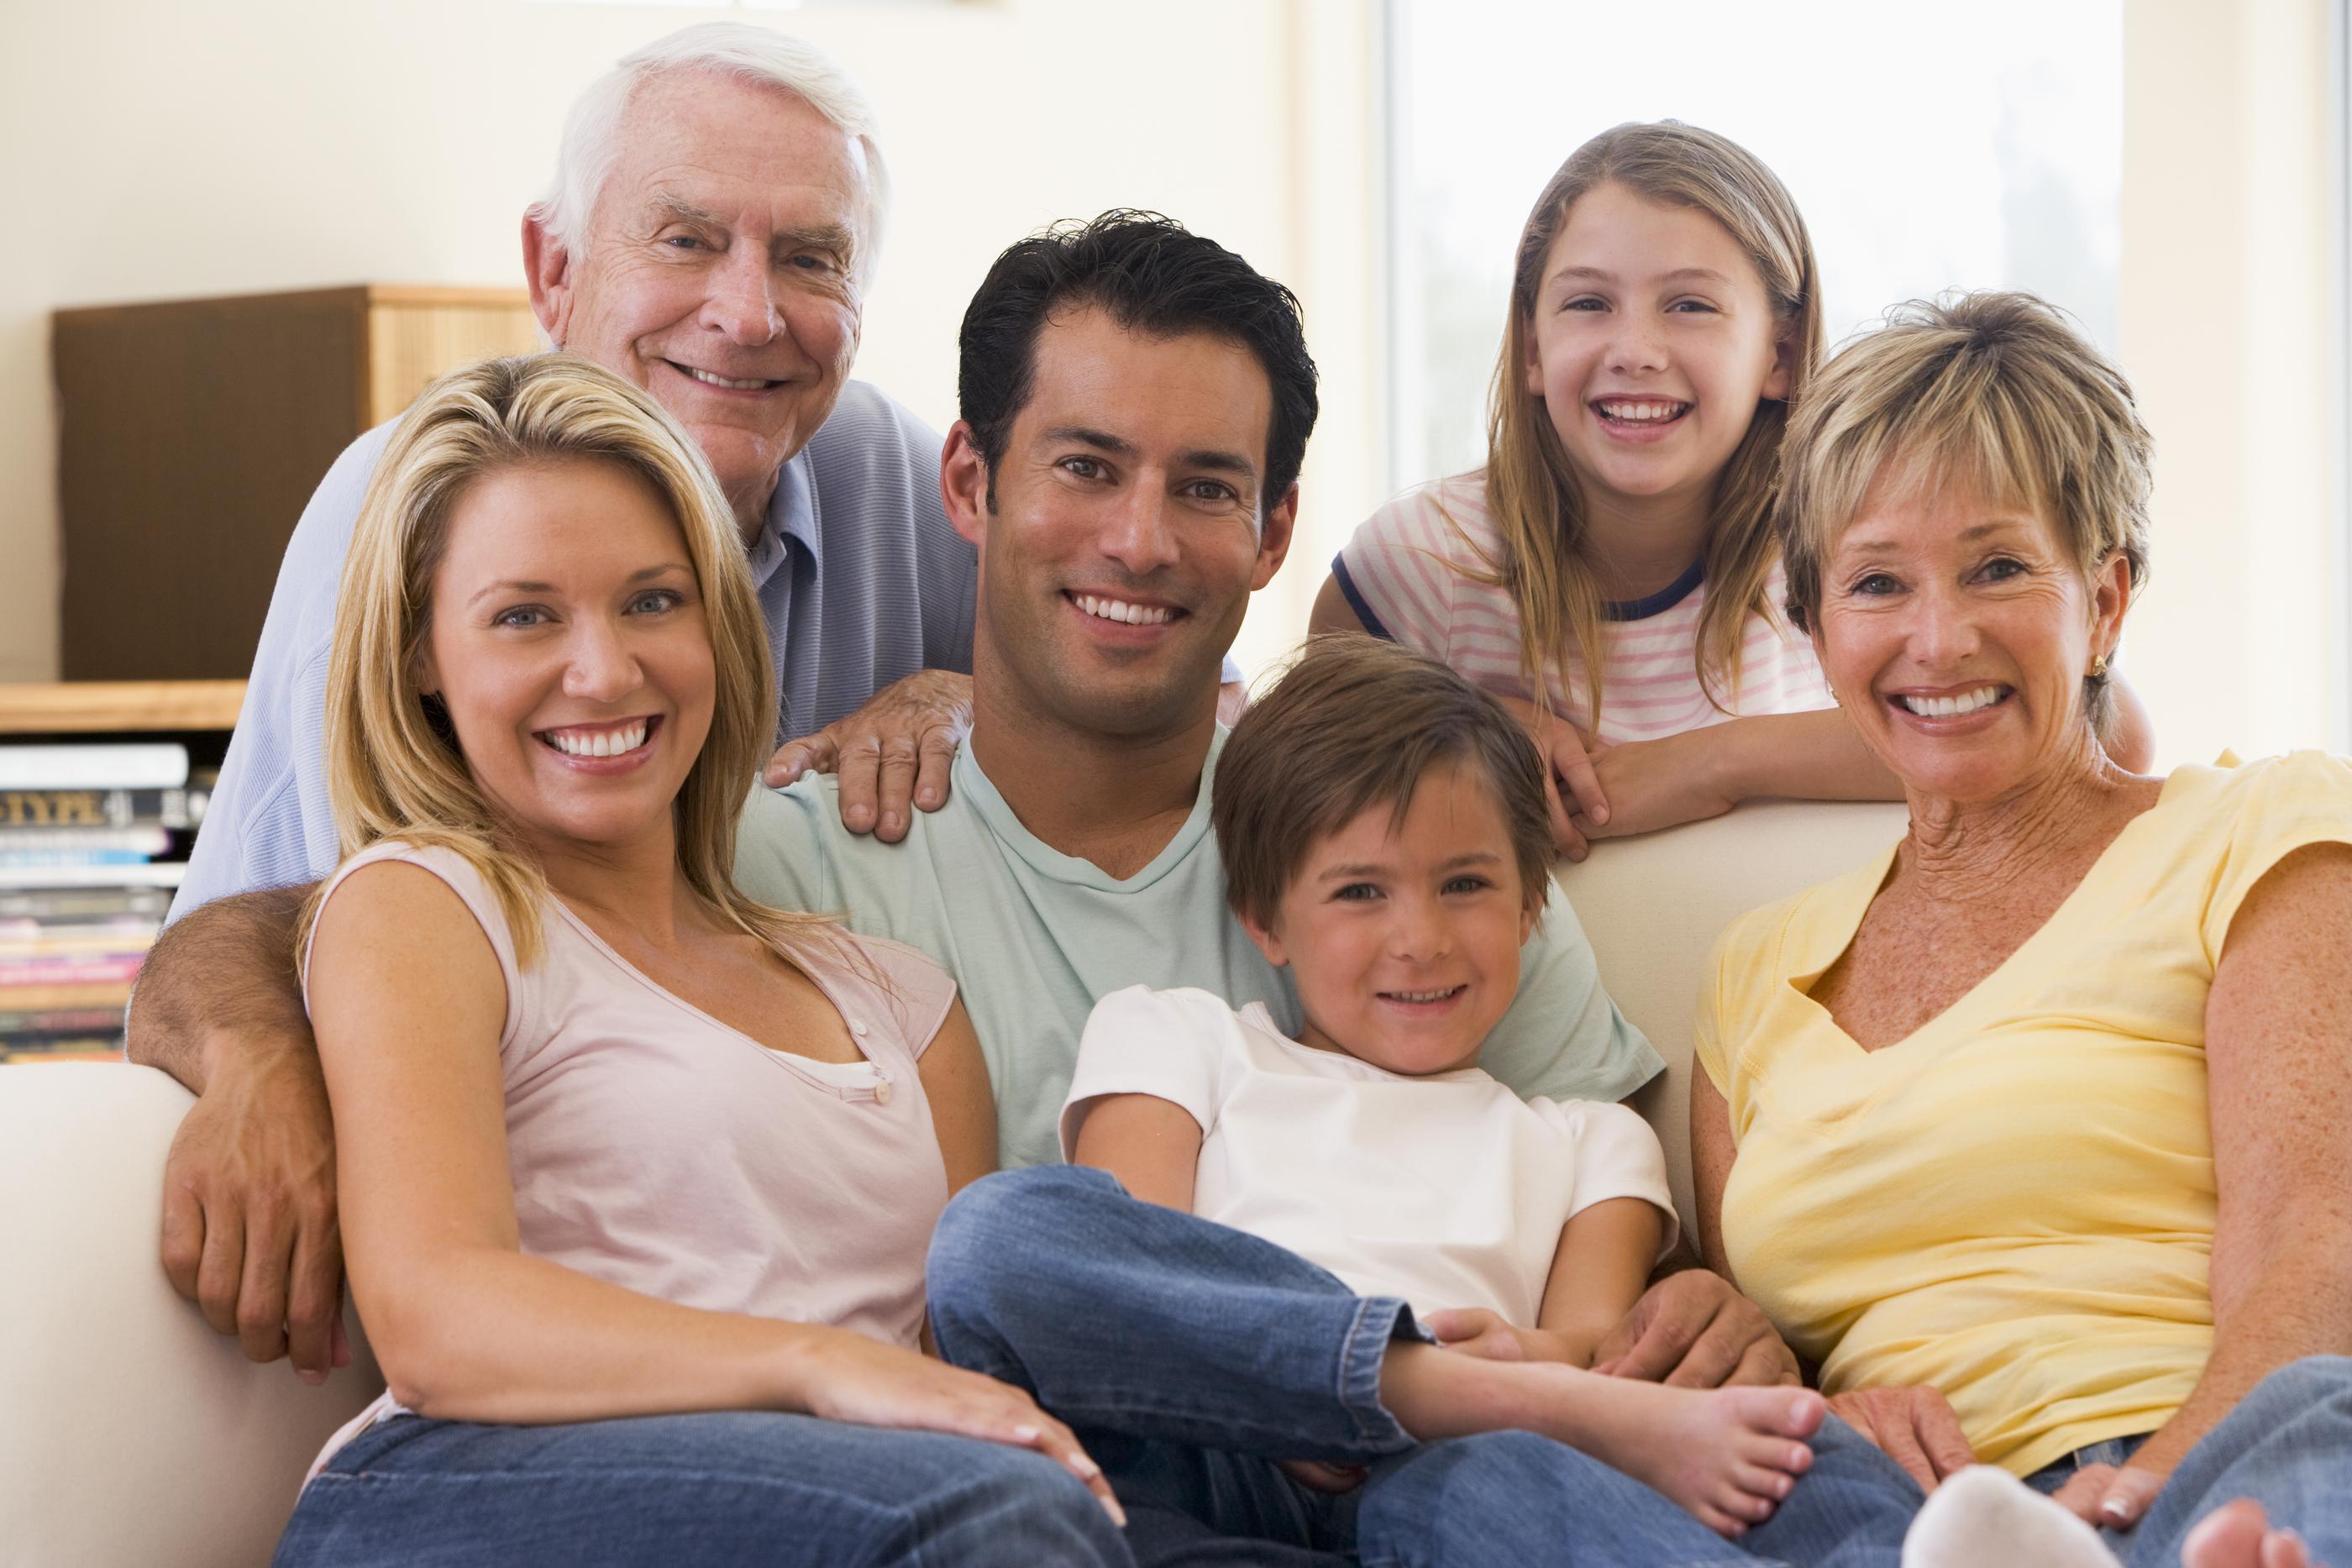 Extended Families In Living Room Smiling.jpg